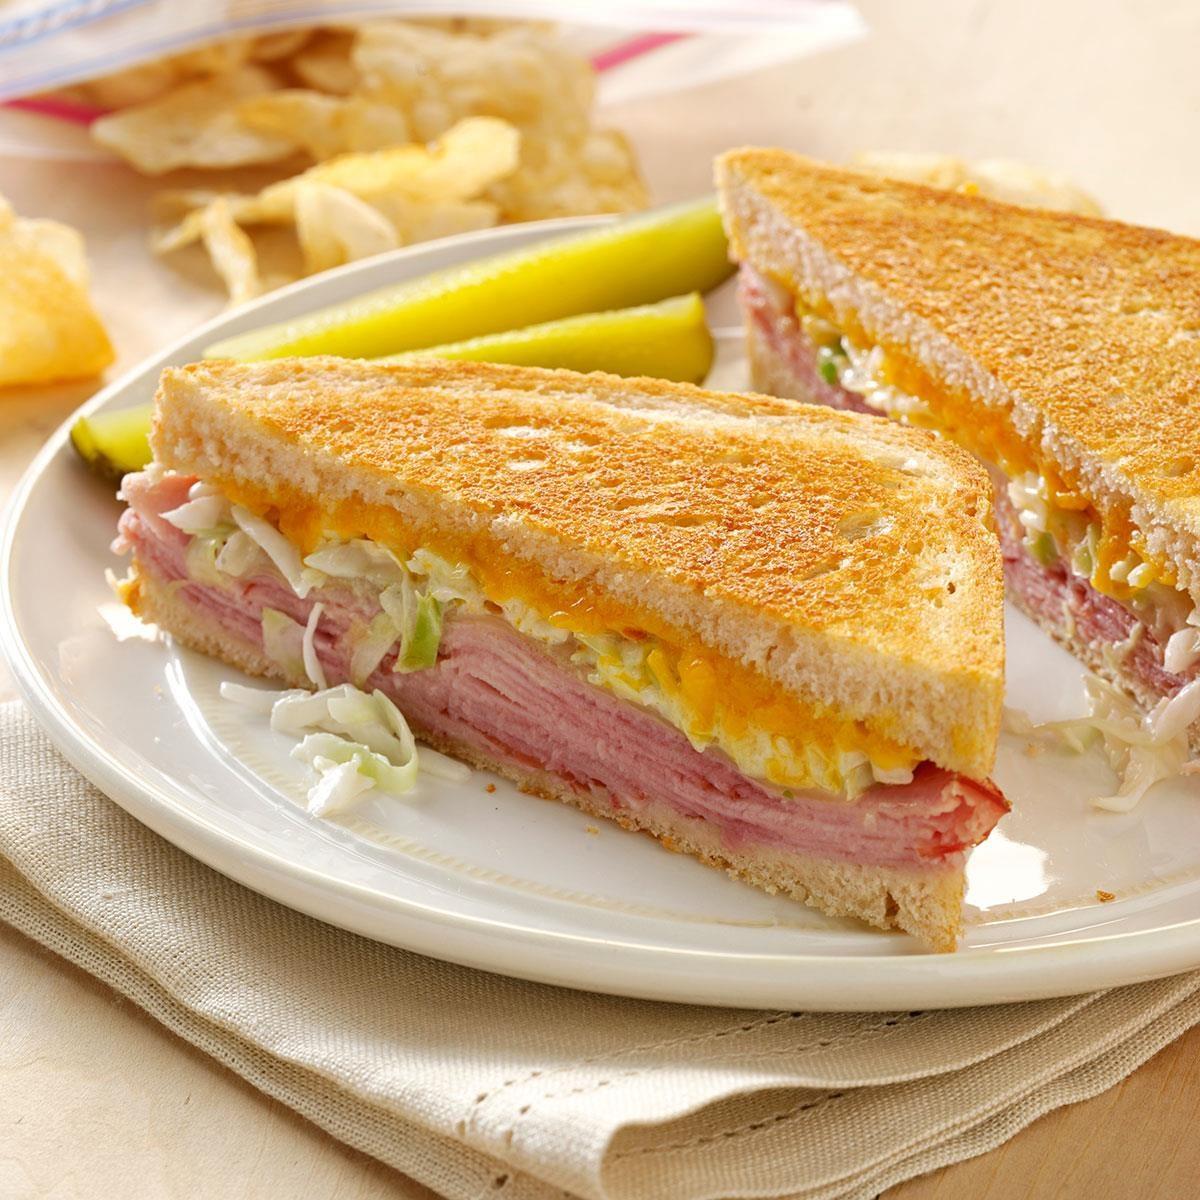 Zesty Grilled Sandwiches Recipe